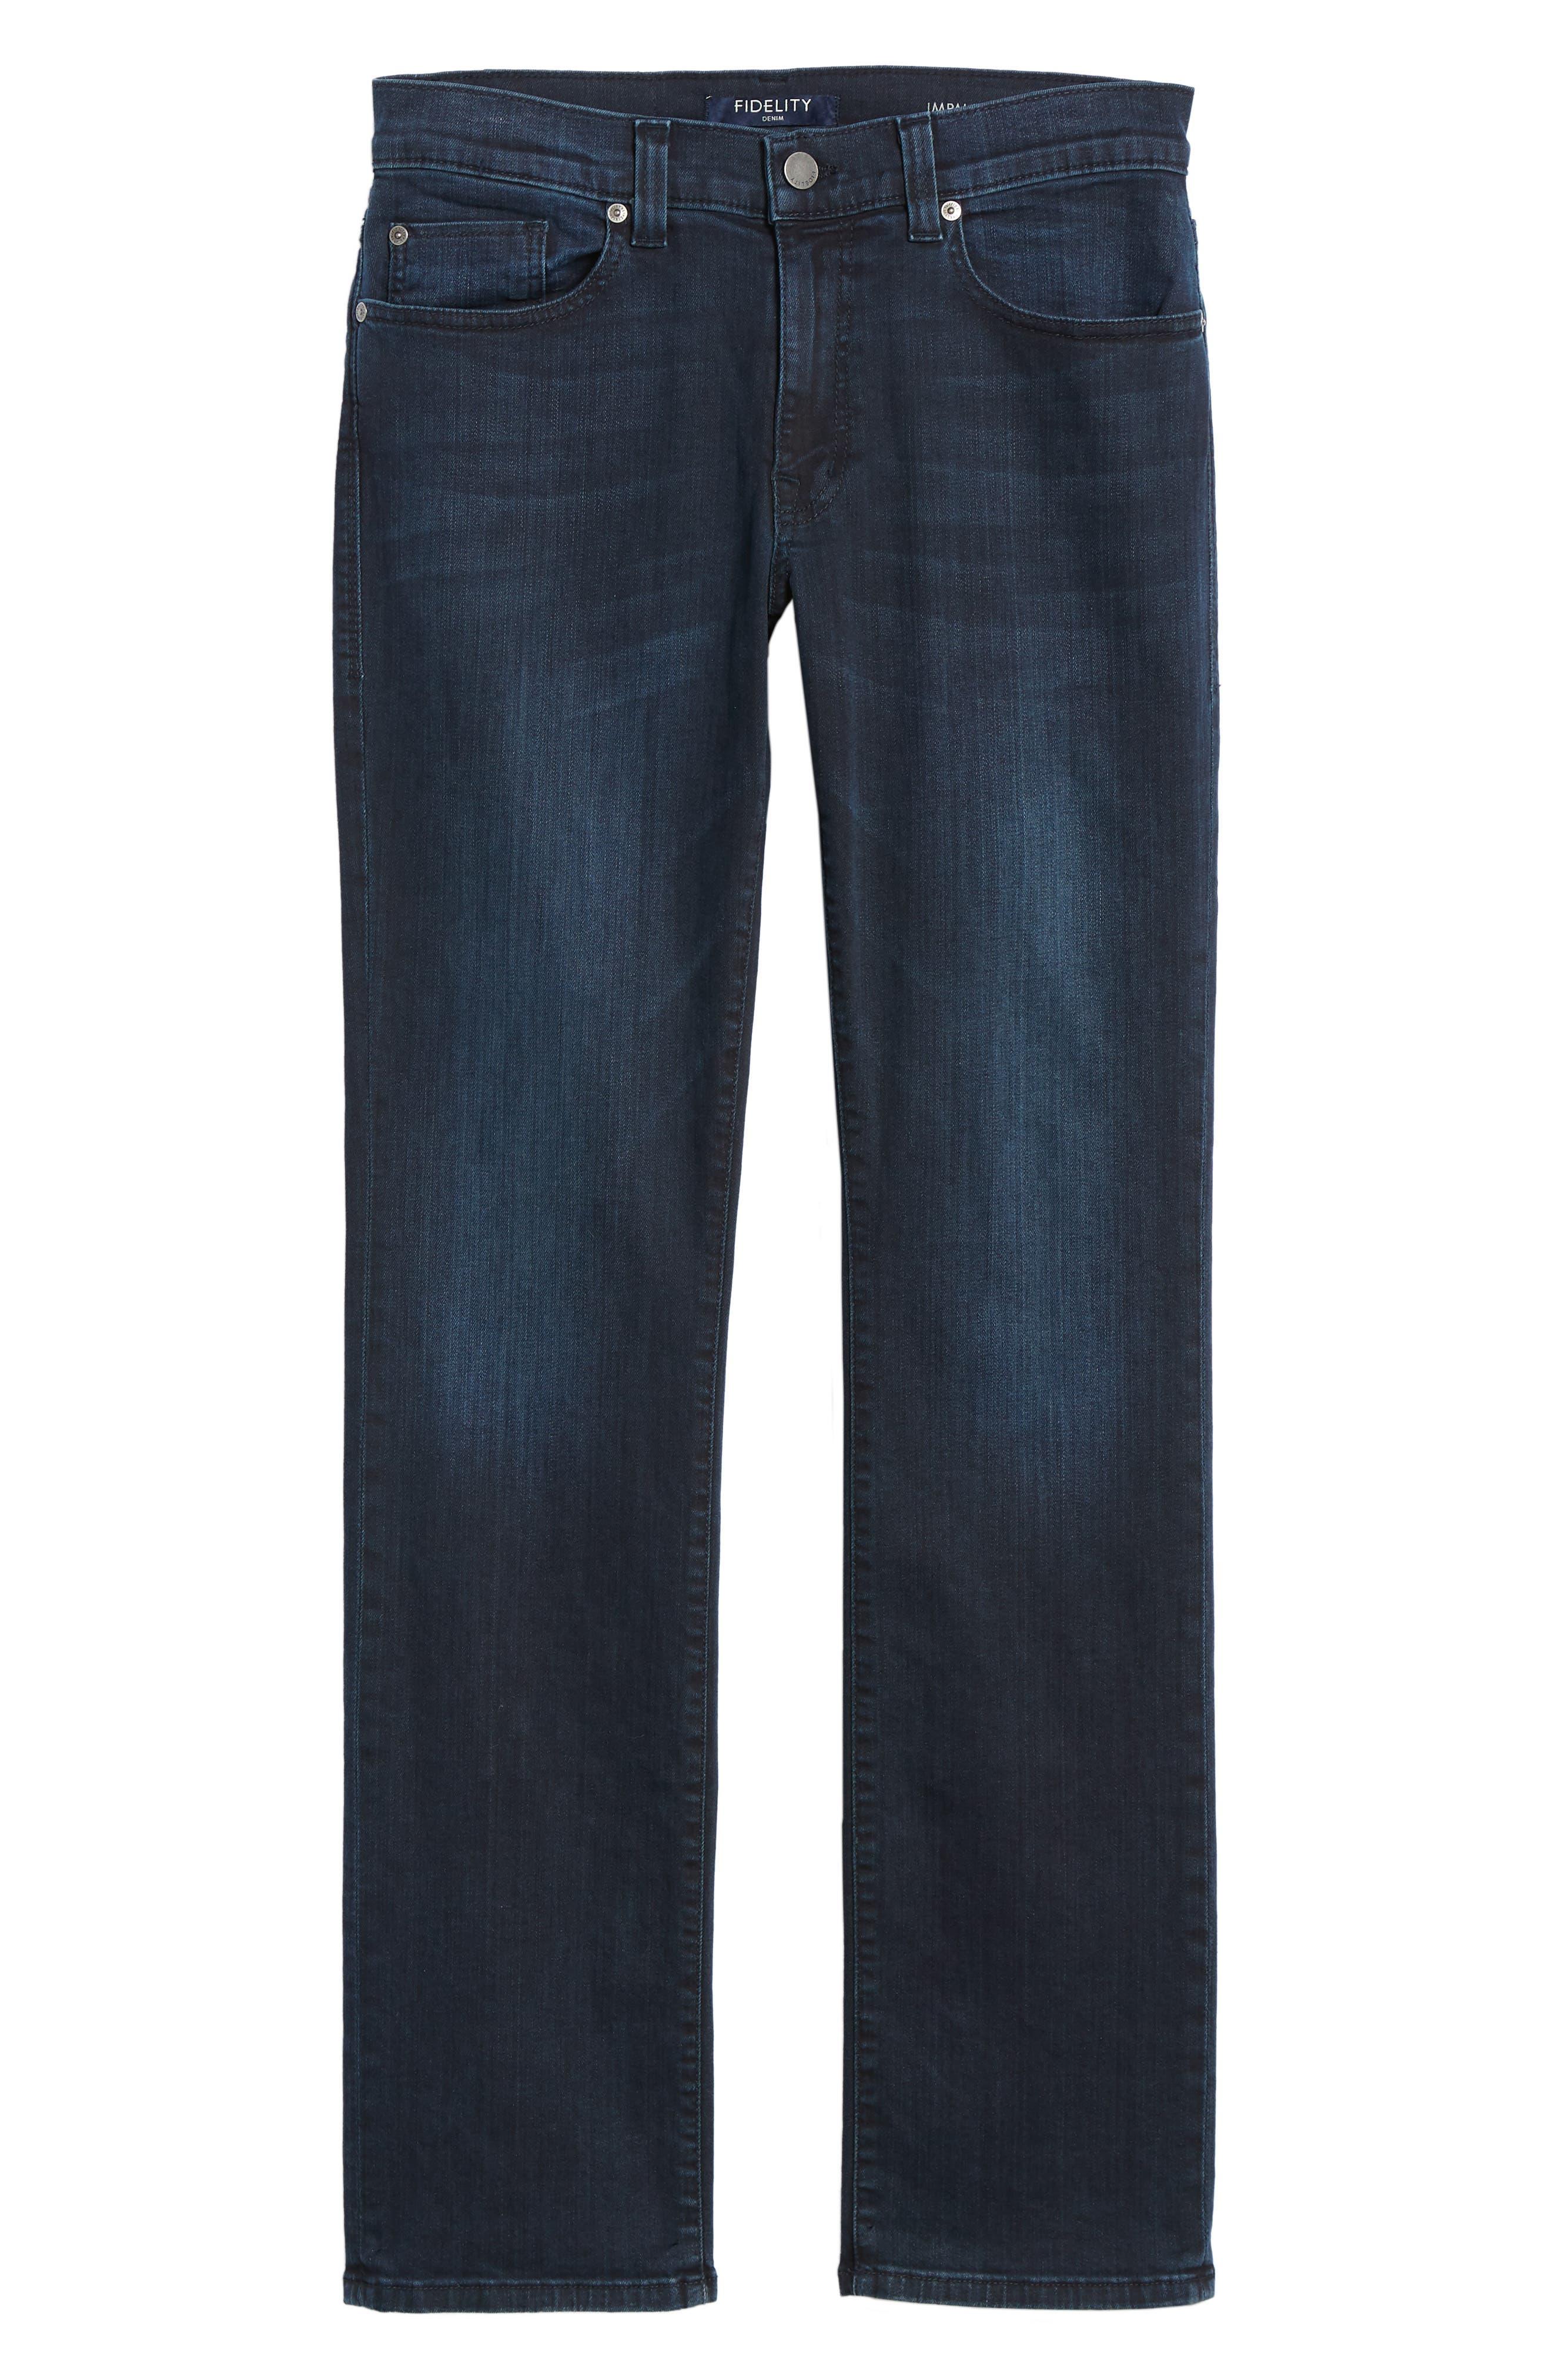 Impala Straight Leg Jeans,                             Alternate thumbnail 6, color,                             GENESIS